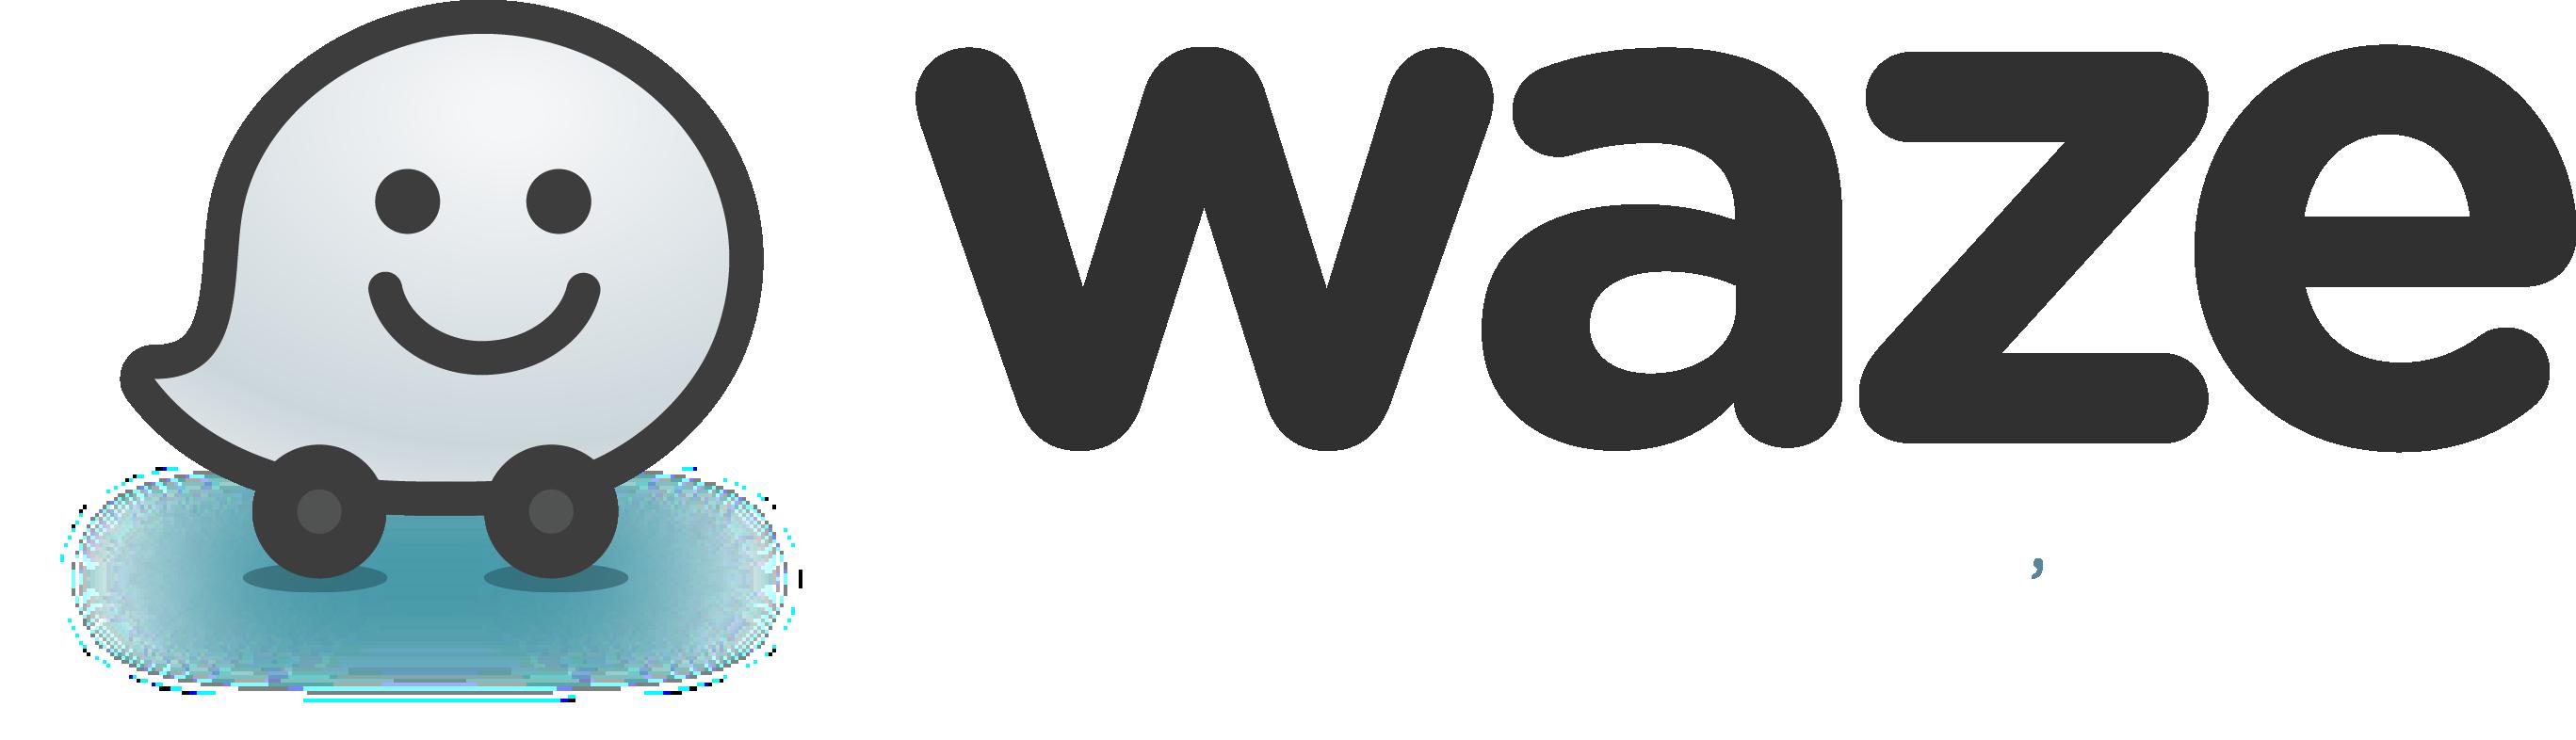 Waze logo clipart png library library waze-logo - TradeshowGuy Blog png library library